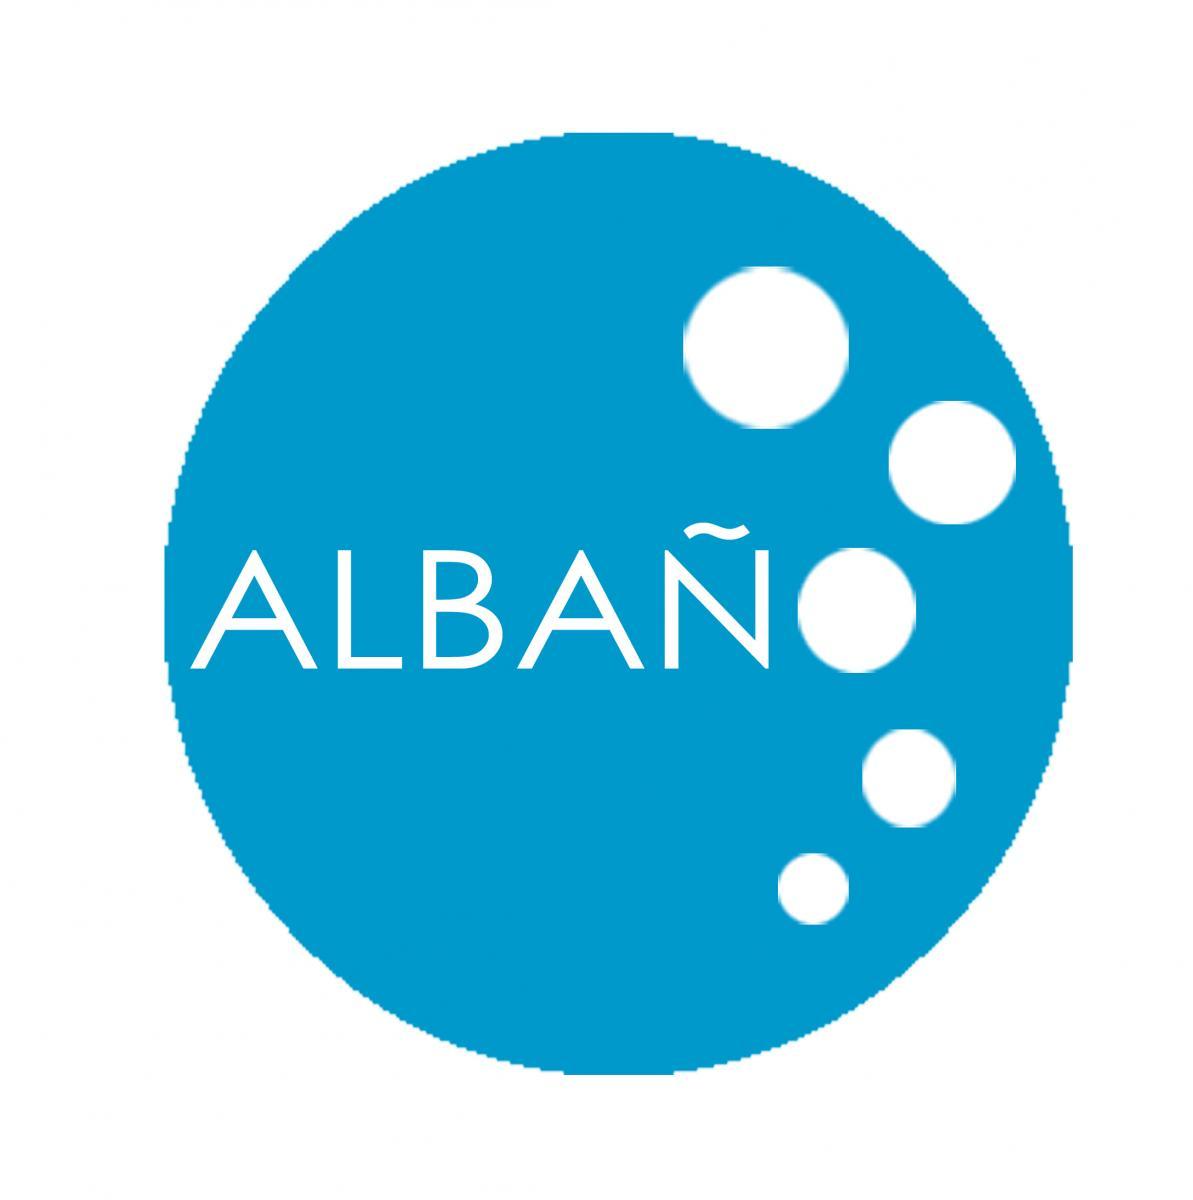 albaño